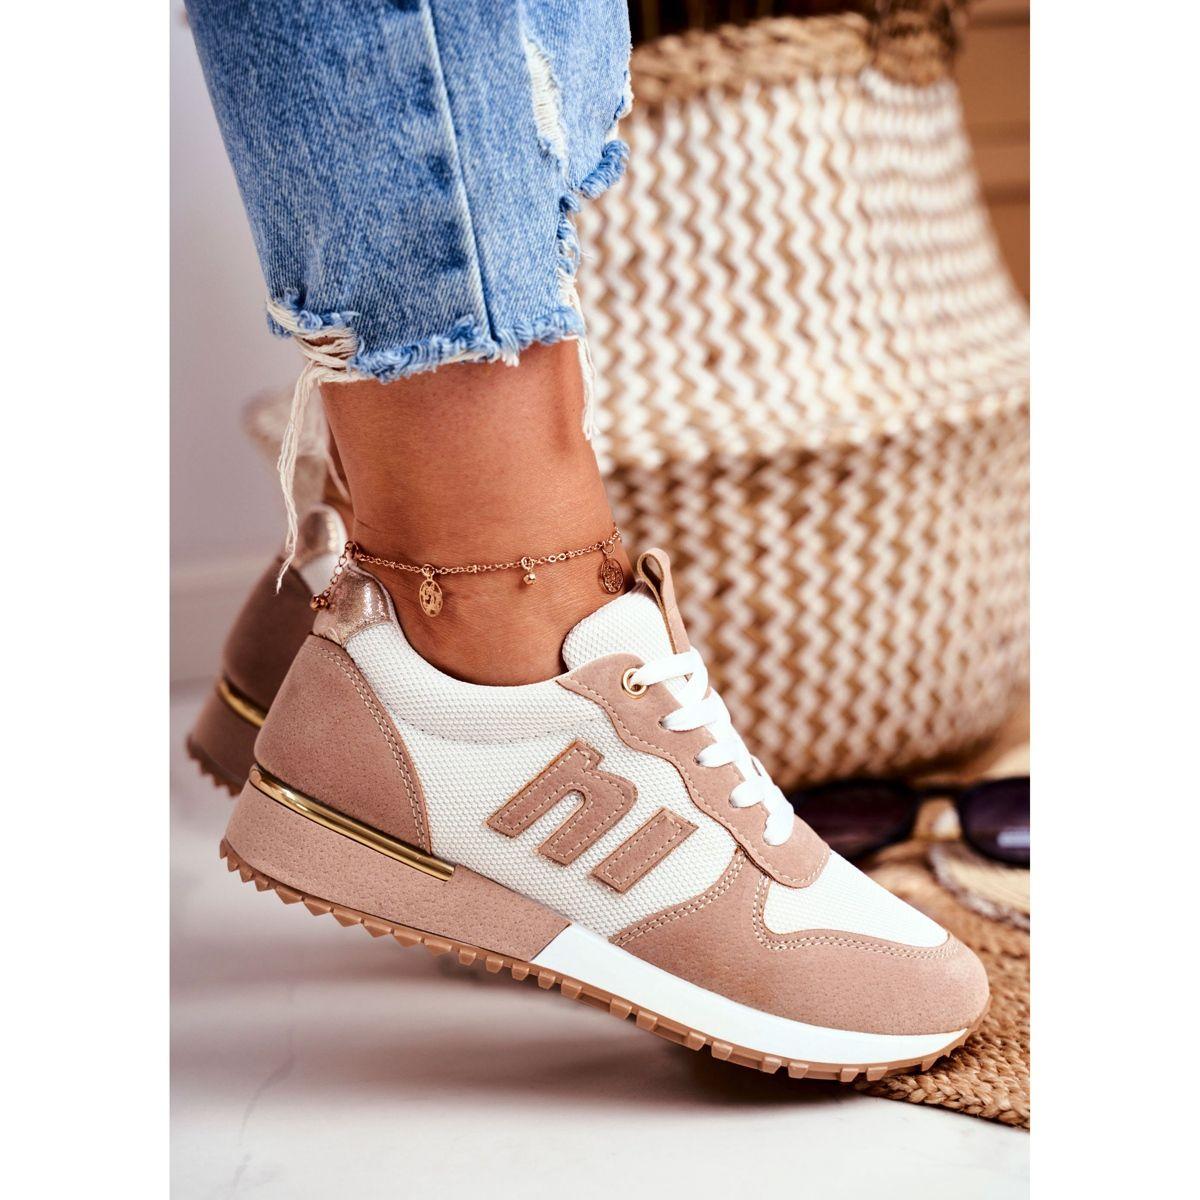 Sportowe Damskie Buty Brazowe Zlote Elementy Maddie Shoes Asics Sneaker Sneakers